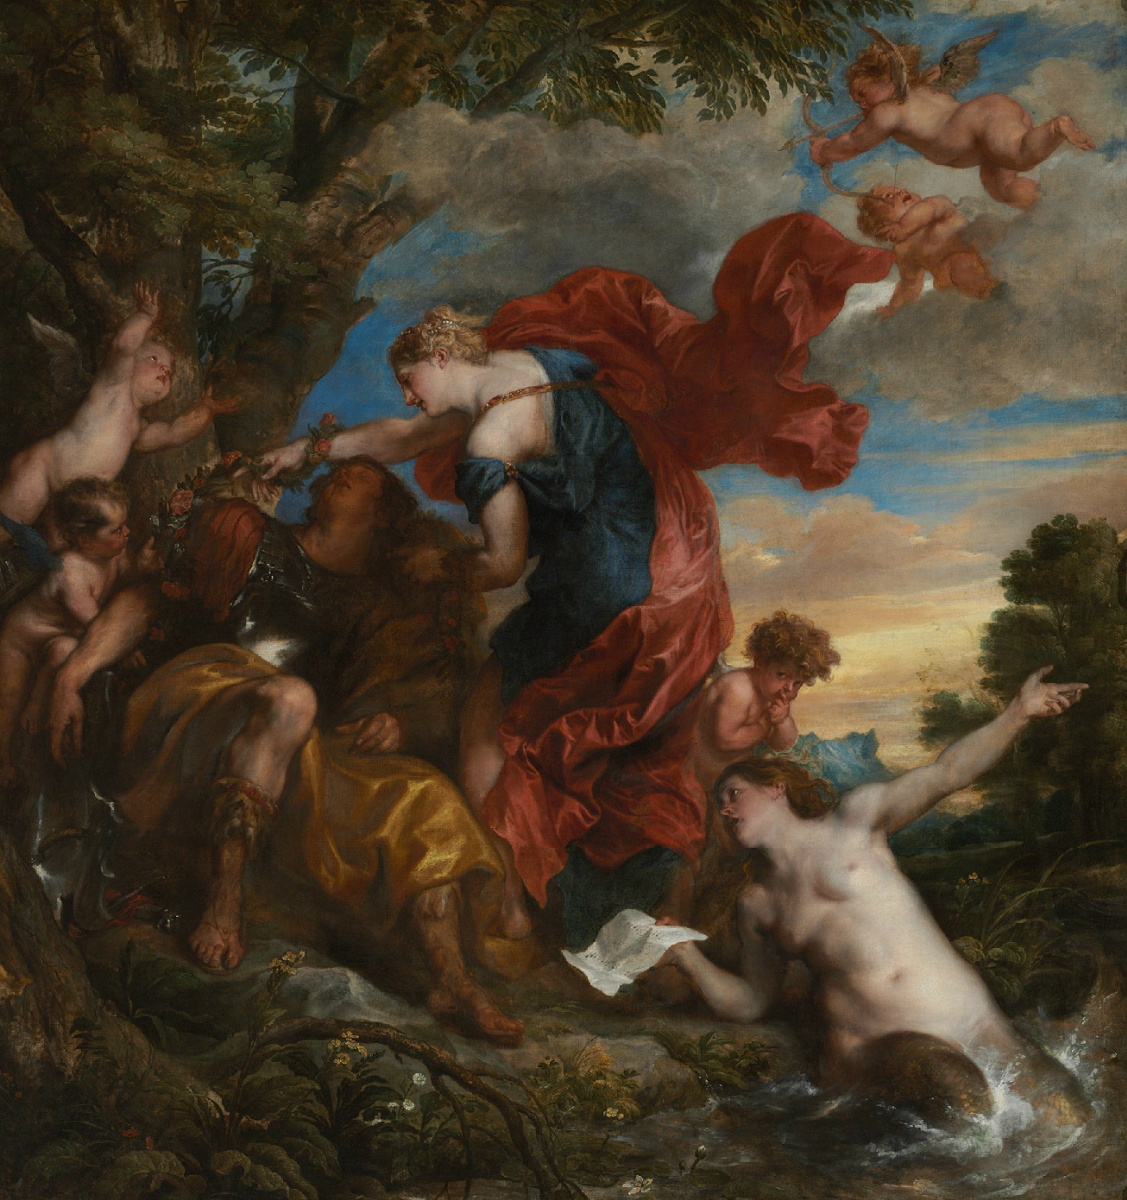 Anthony van Dyck. Rinaldo and Armida